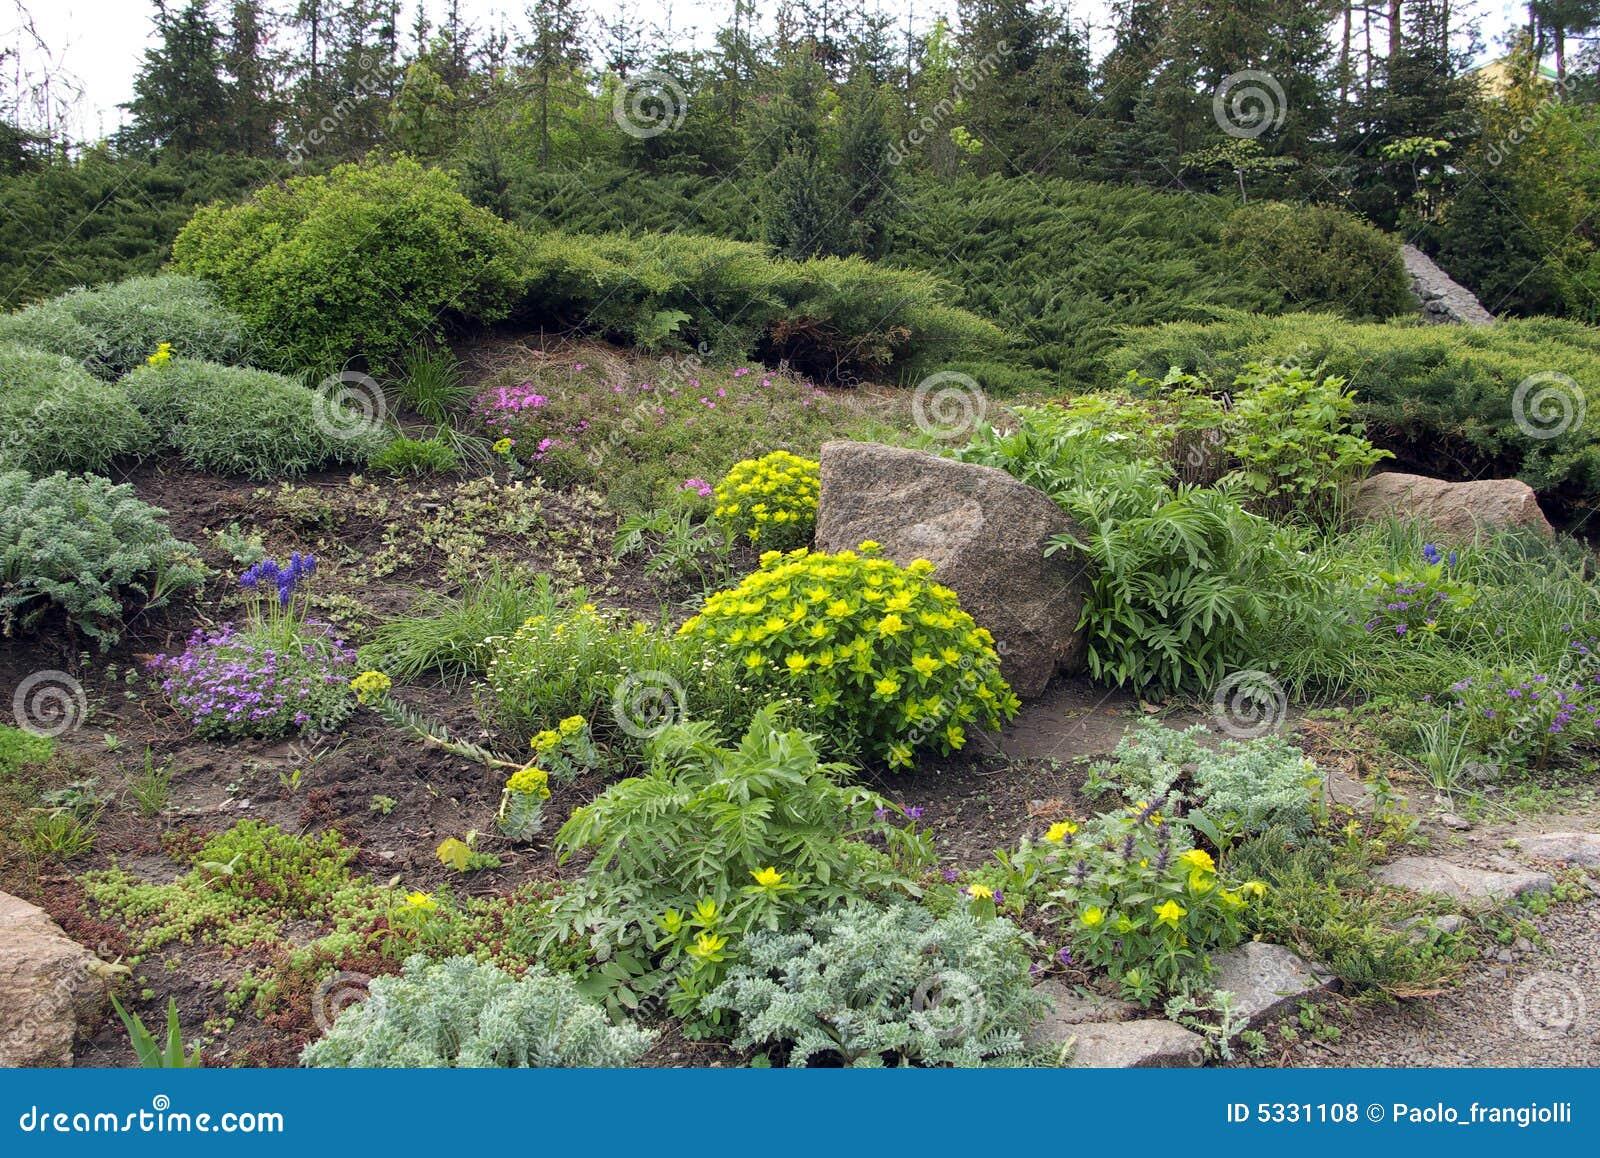 Calzada de piedra que pasa a través de las flores